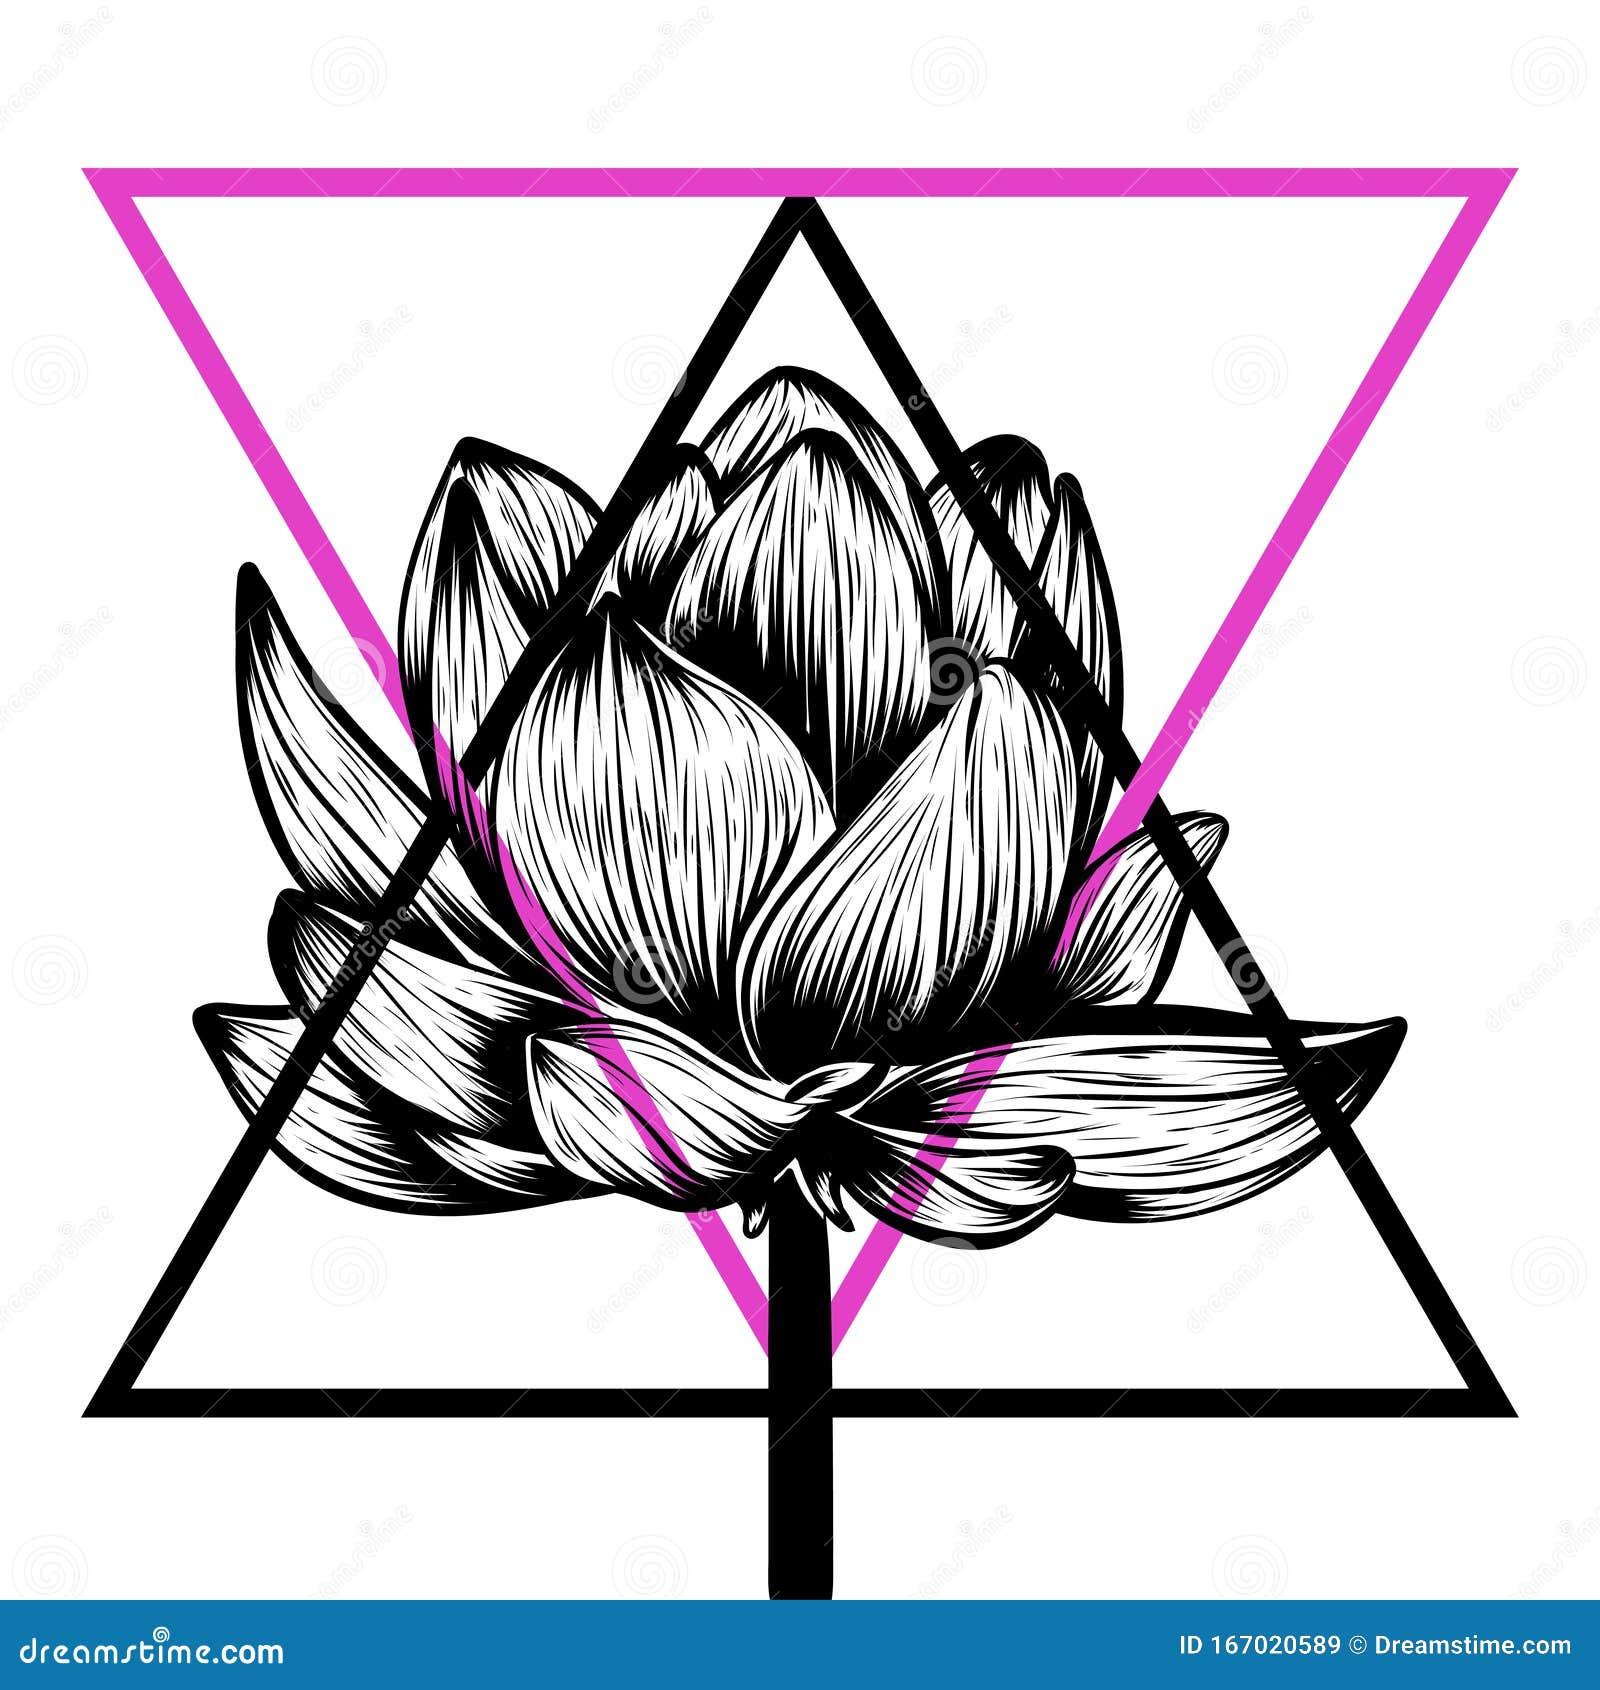 Hand Drawn Illustration Of Lotus Flower Stock Illustration Illustration Of Drawn Decorative 167020589